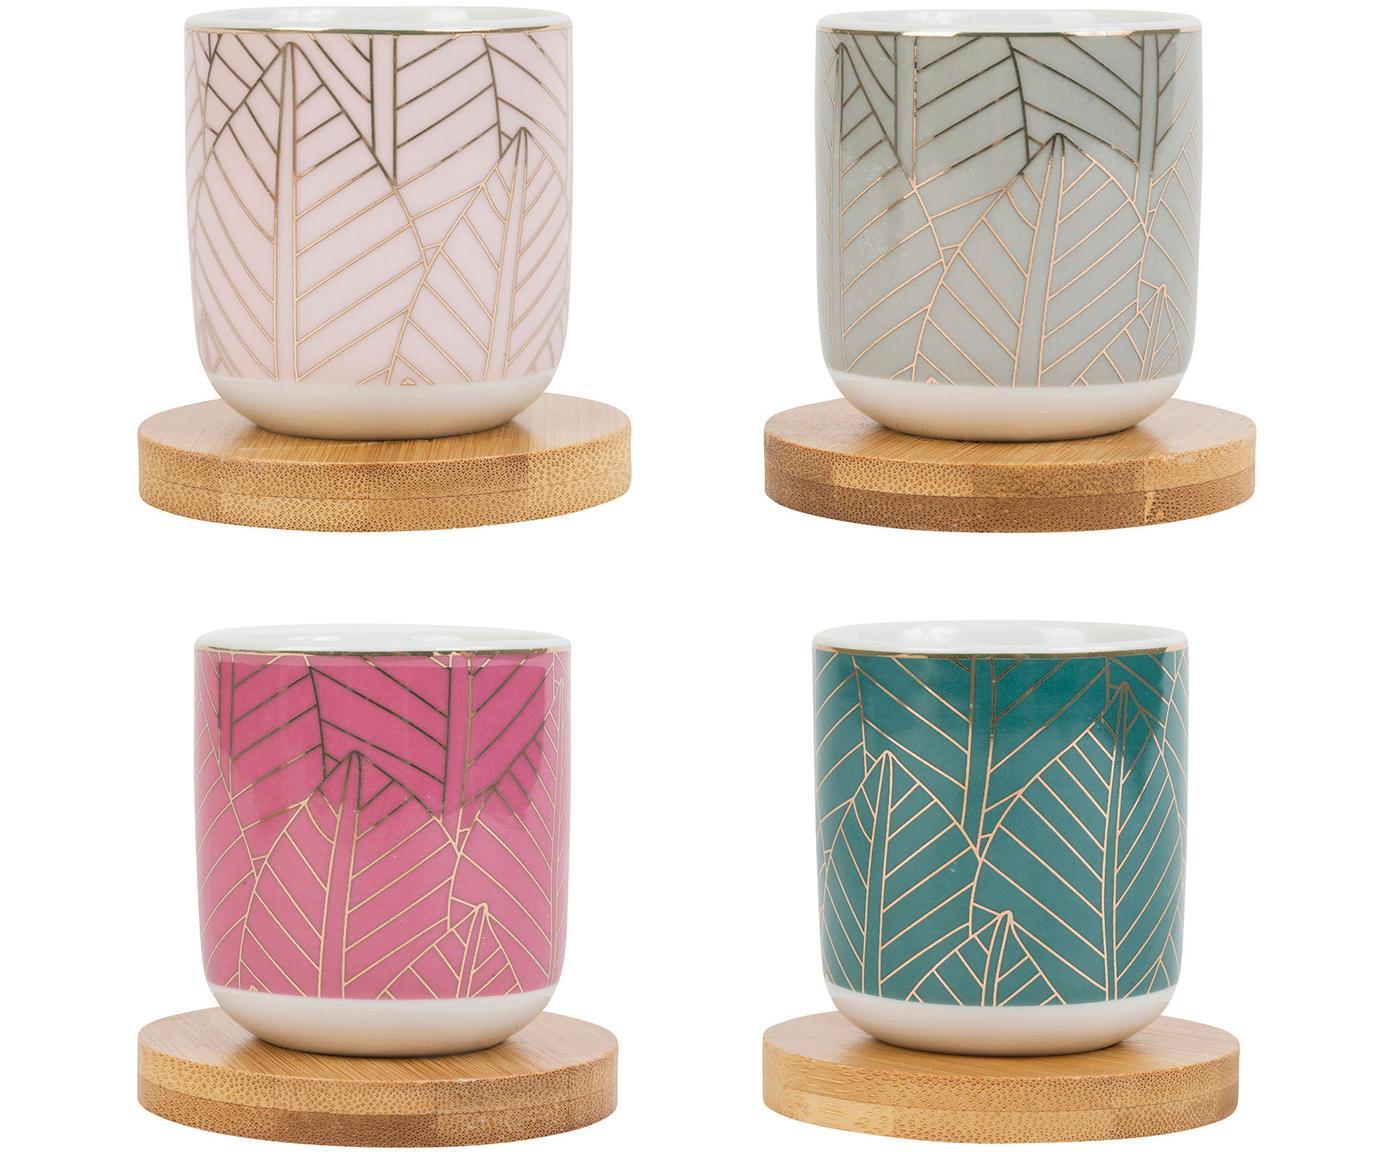 XS Becher mit Bambusuntersetzer Orfe, 8-tlg., Becher: Porzellan, Untersetzer: Bambus, Mehrfarbig, Ø 6 x H 7 cm